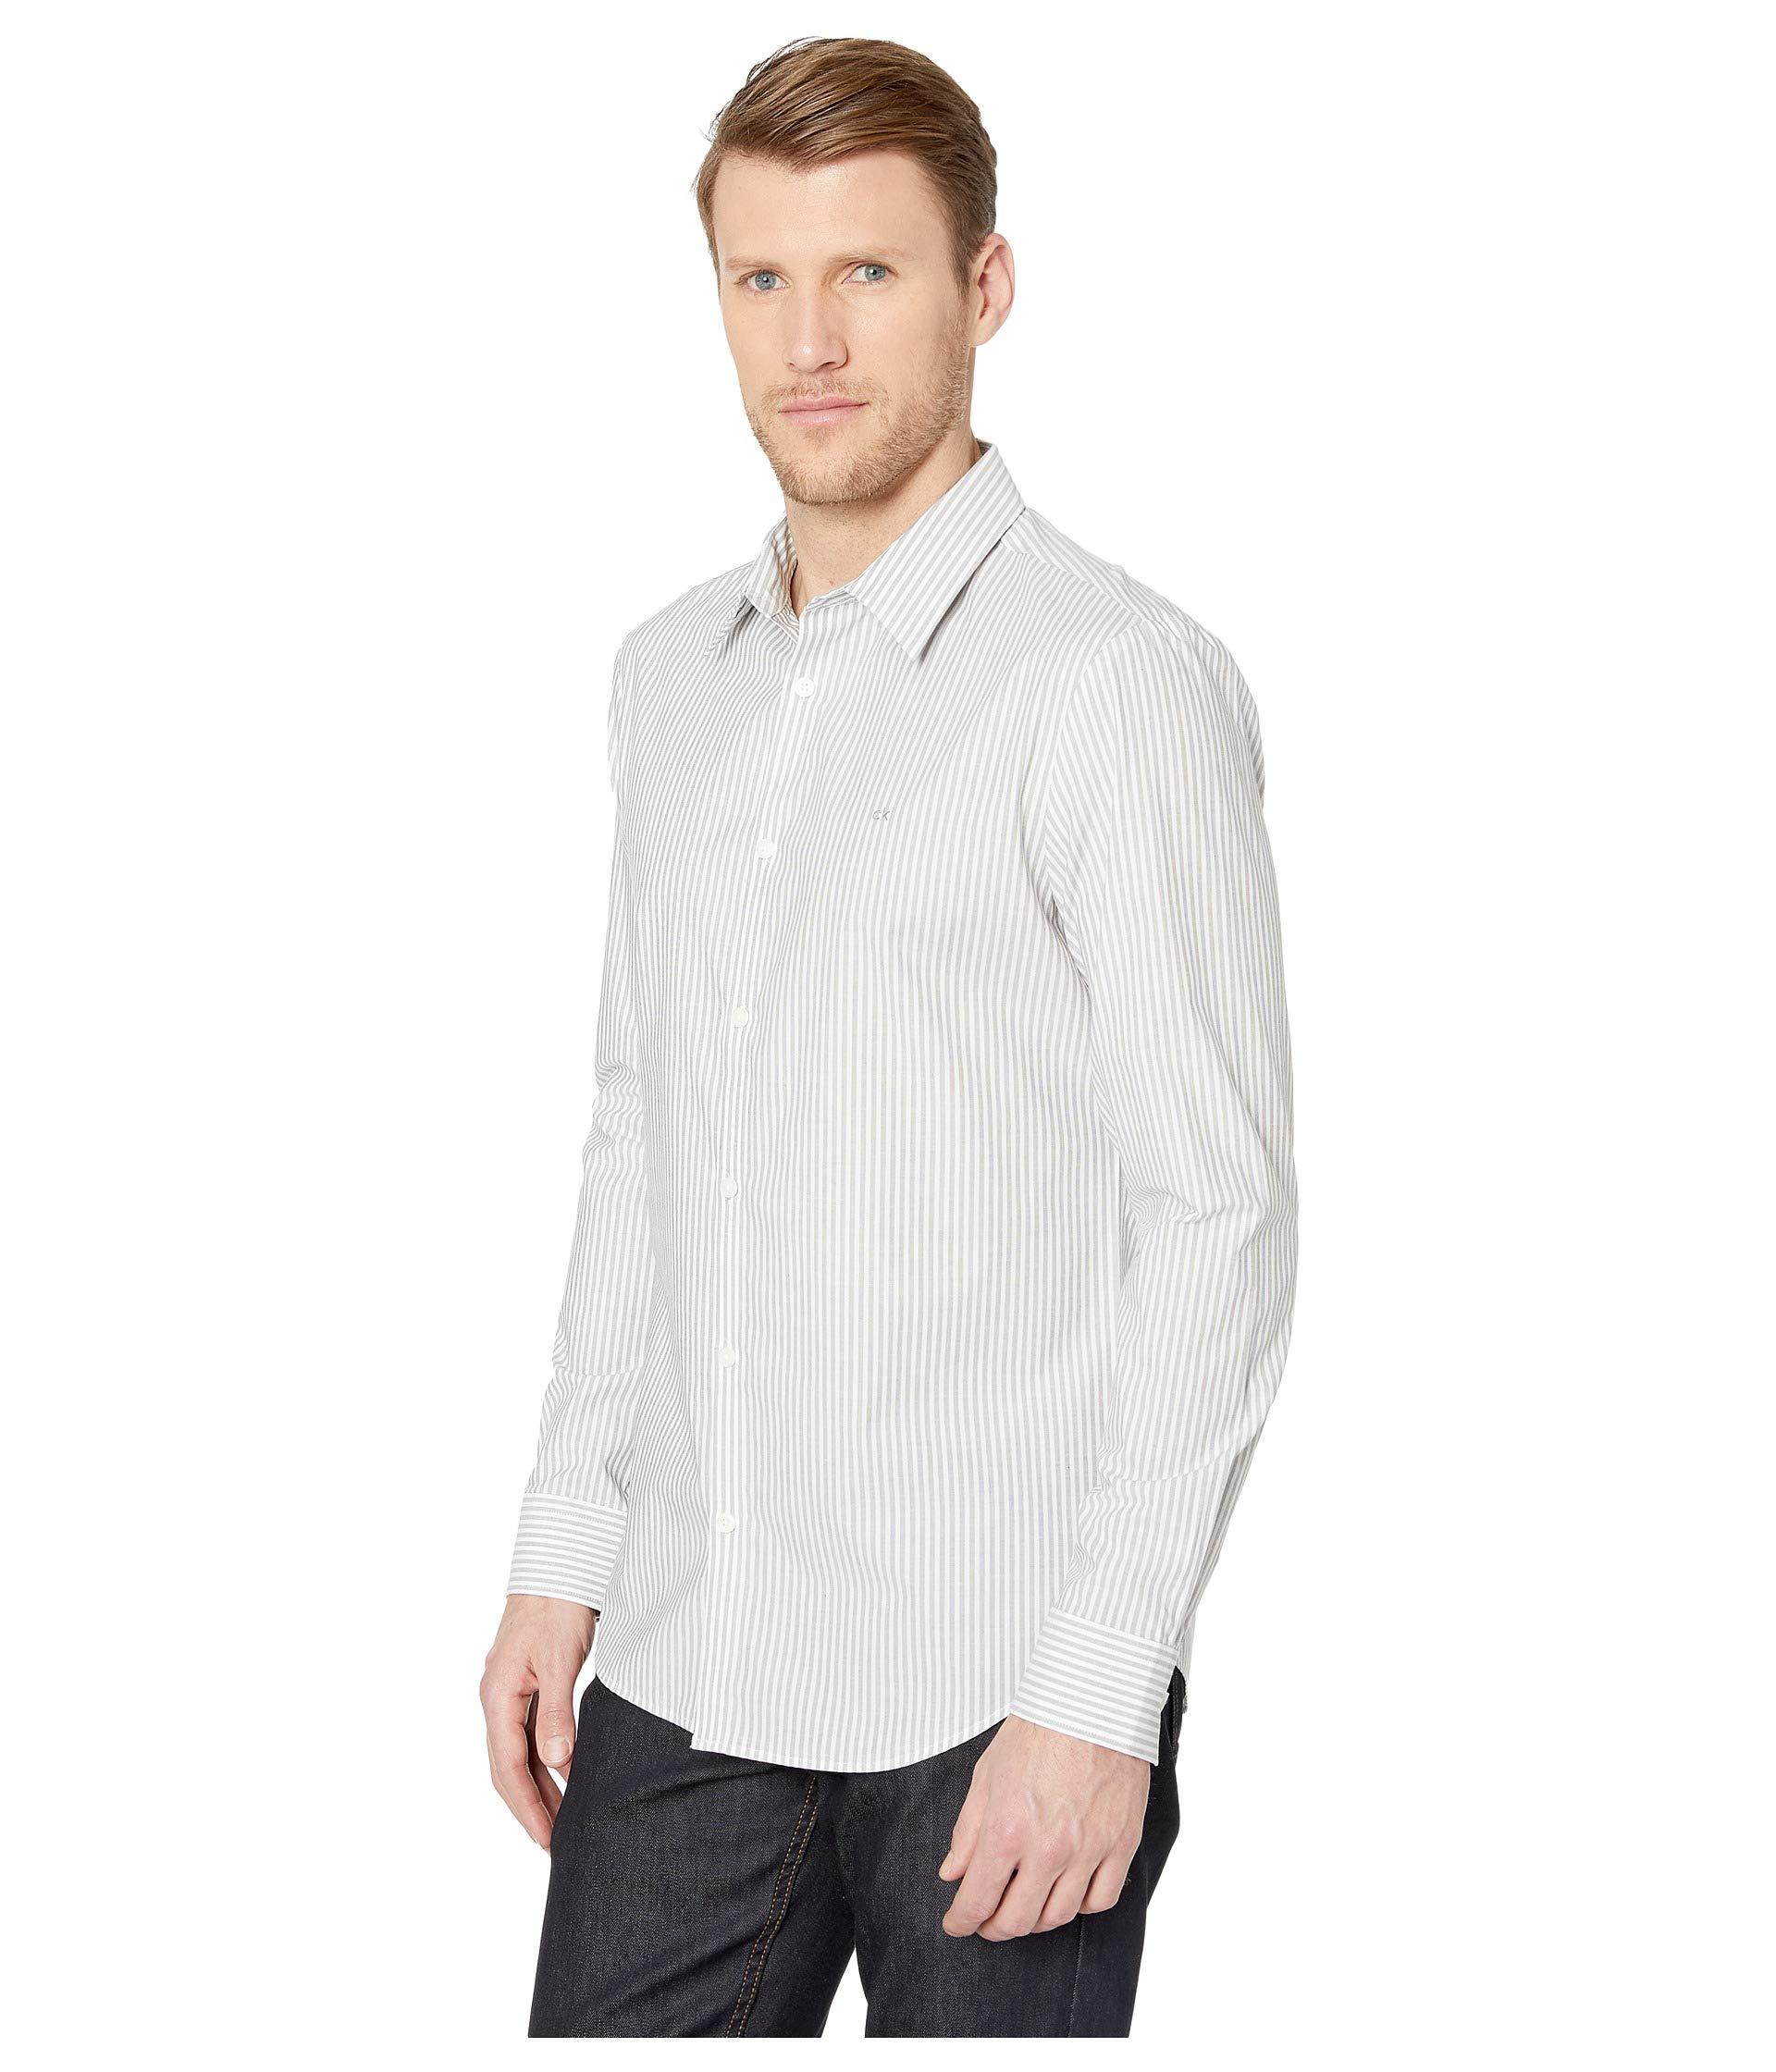 a5ec9ad36c5 Lyst - Calvin Klein The Stretch-cotton Shirt (black) Men s Clothing in Black  for Men